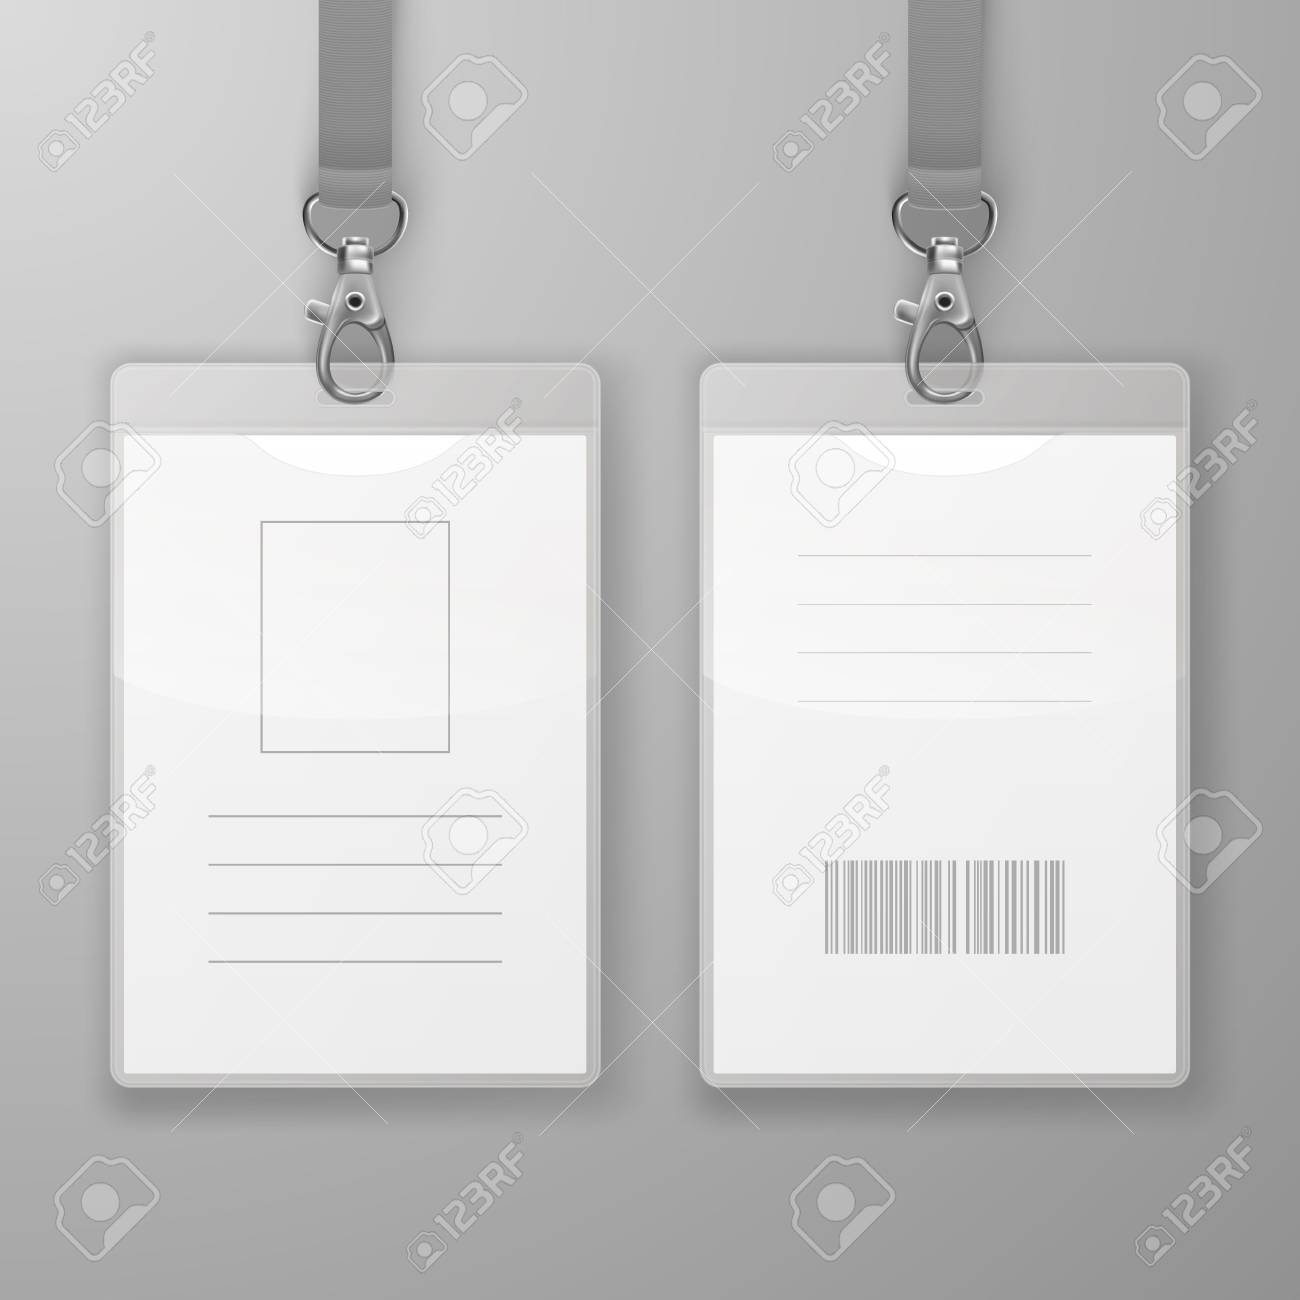 100 CR80 30Mil White Blank PVC Plastic Cards For Photo ID Card Zebra, Fargo, NB